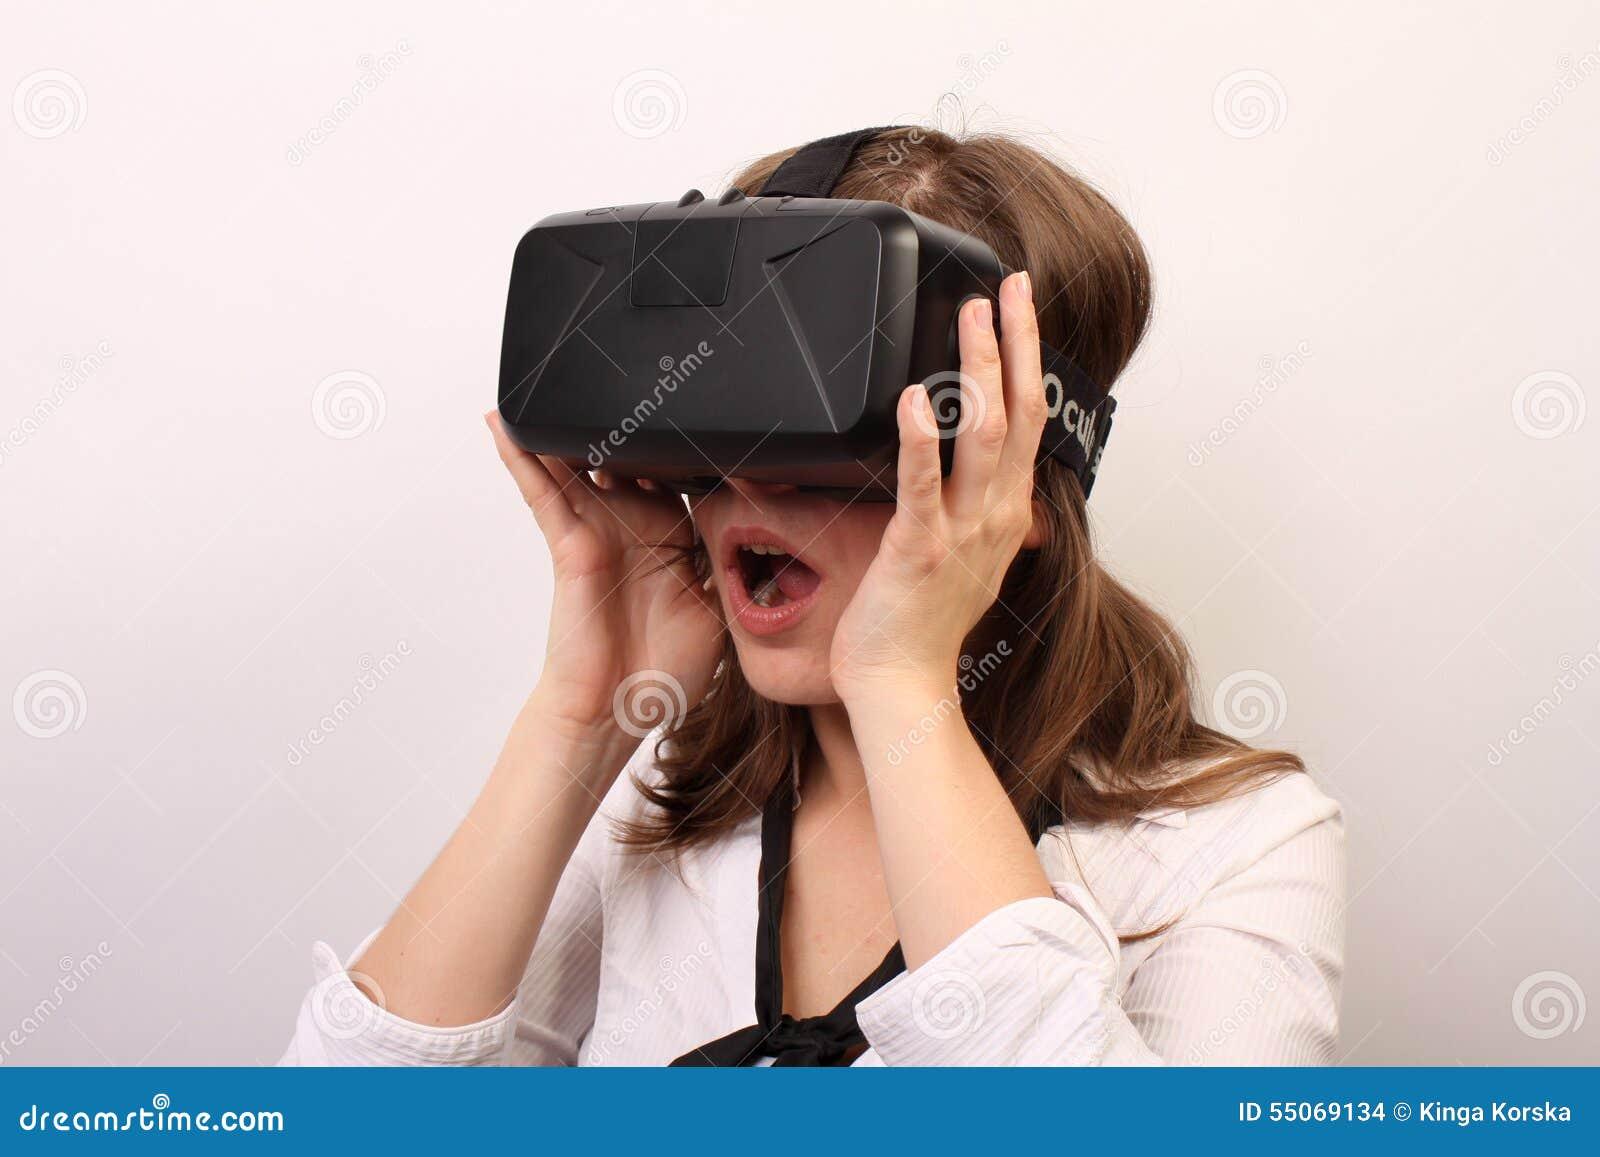 off virtual